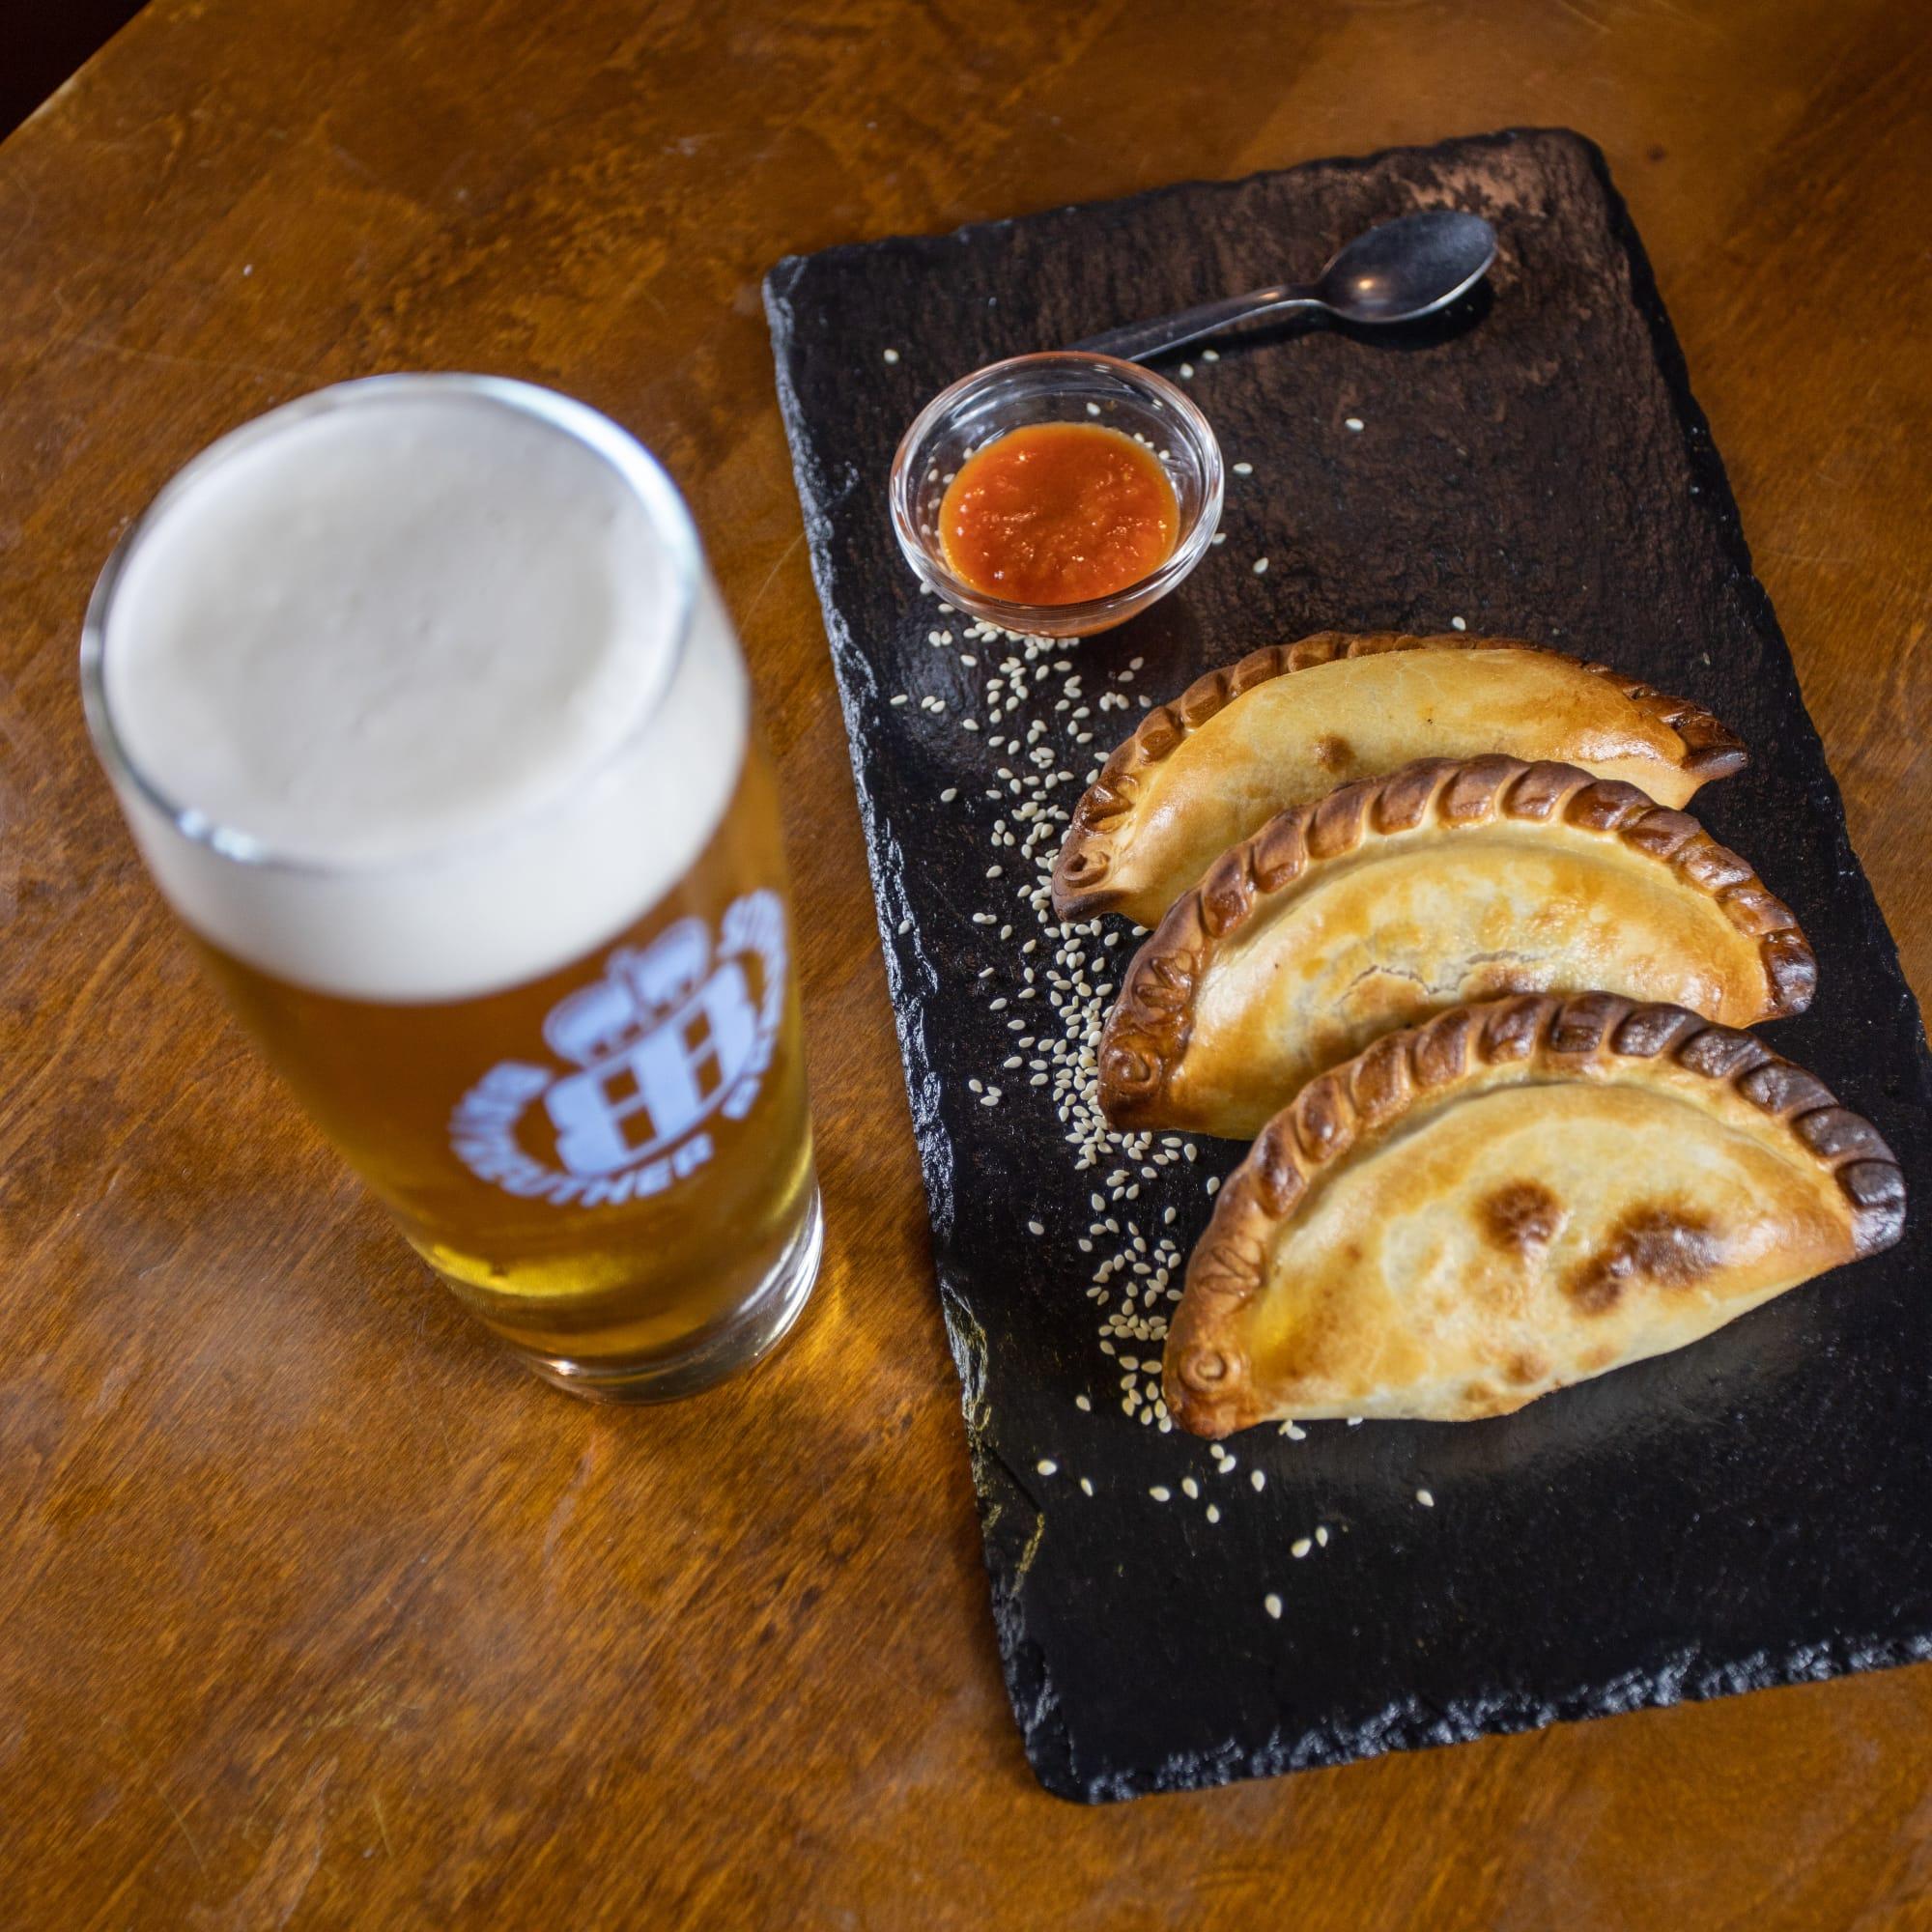 Empanadas Gloria cerveza - Lado|B|erlin.